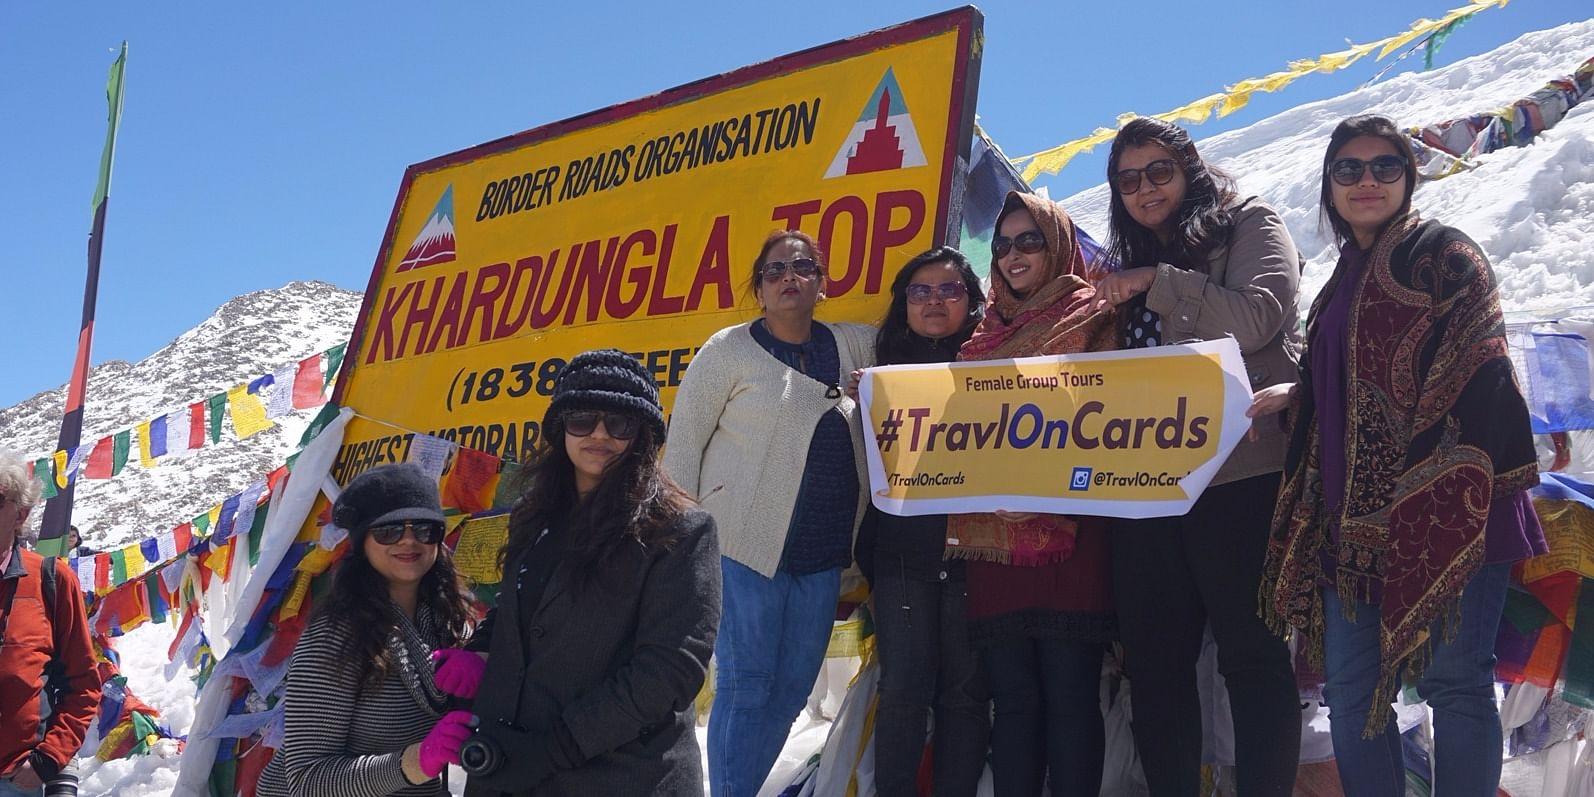 (<b>TOC Women Group</b> at the world's highest &nbsp;motorable road - <b>Khardungla </b>18380 ft.)